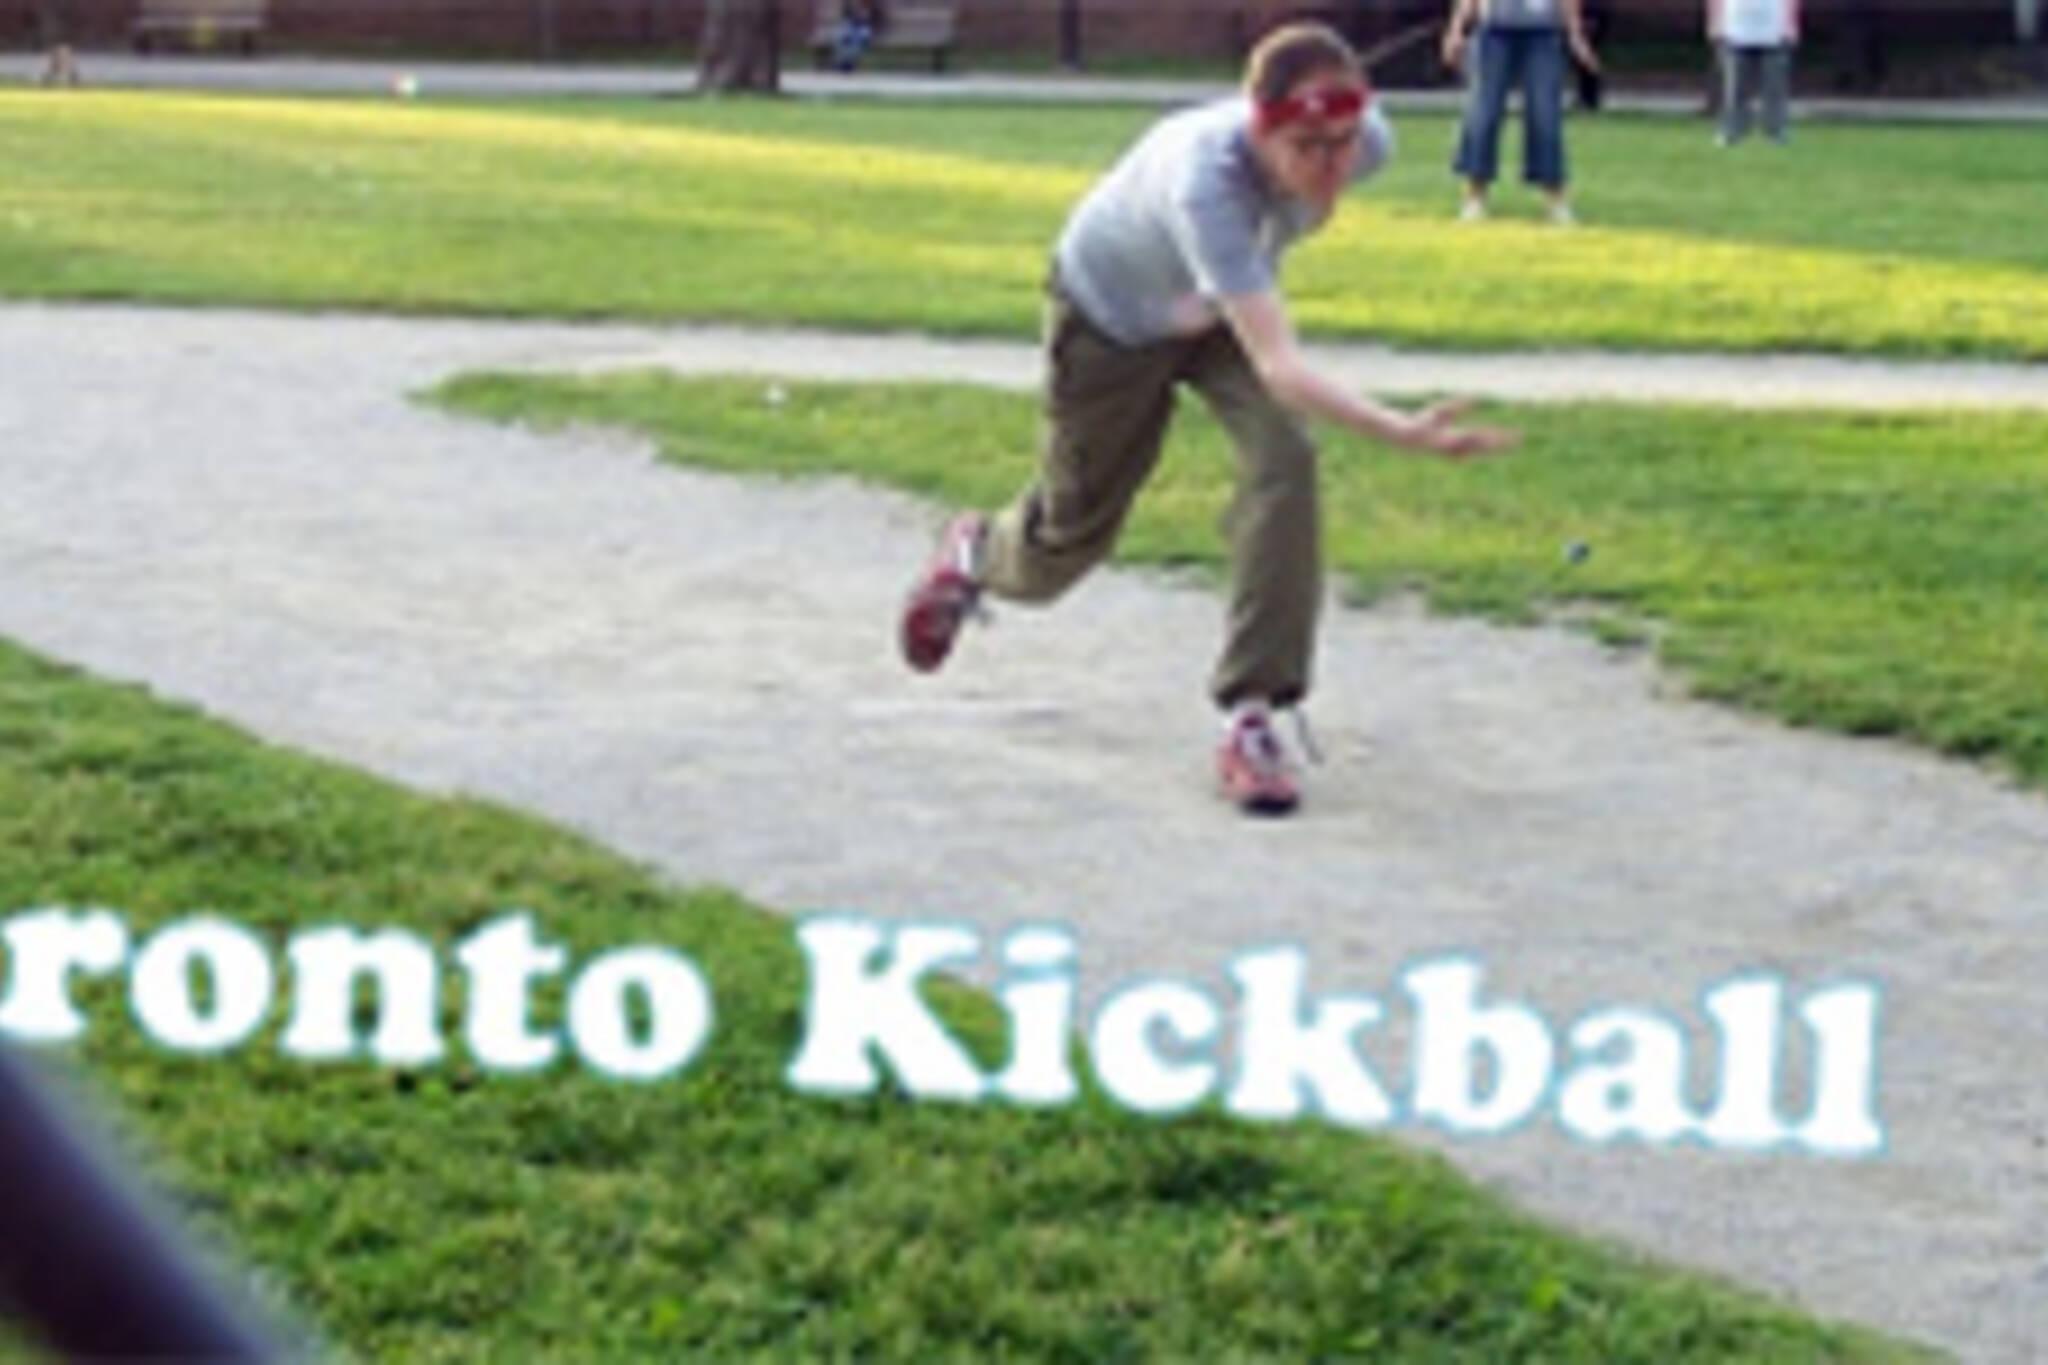 Toronto Kickball